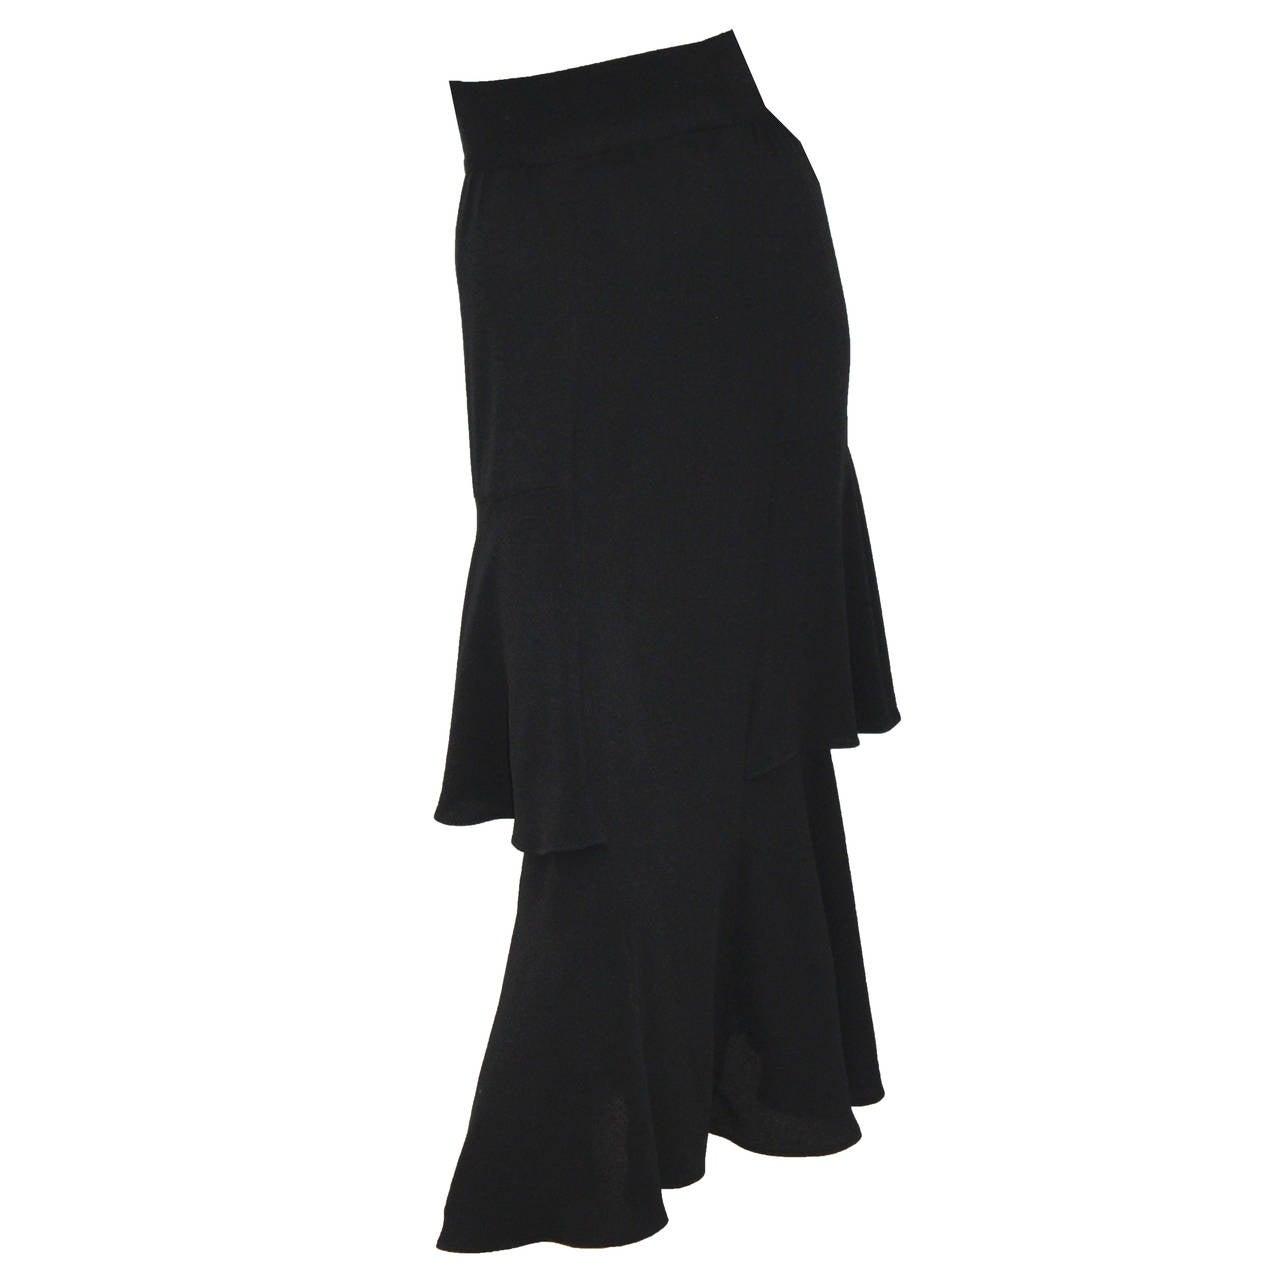 Ossie Clark High Waist Black Moss Crepe Skirt With Peplum Inserts c.1970 1